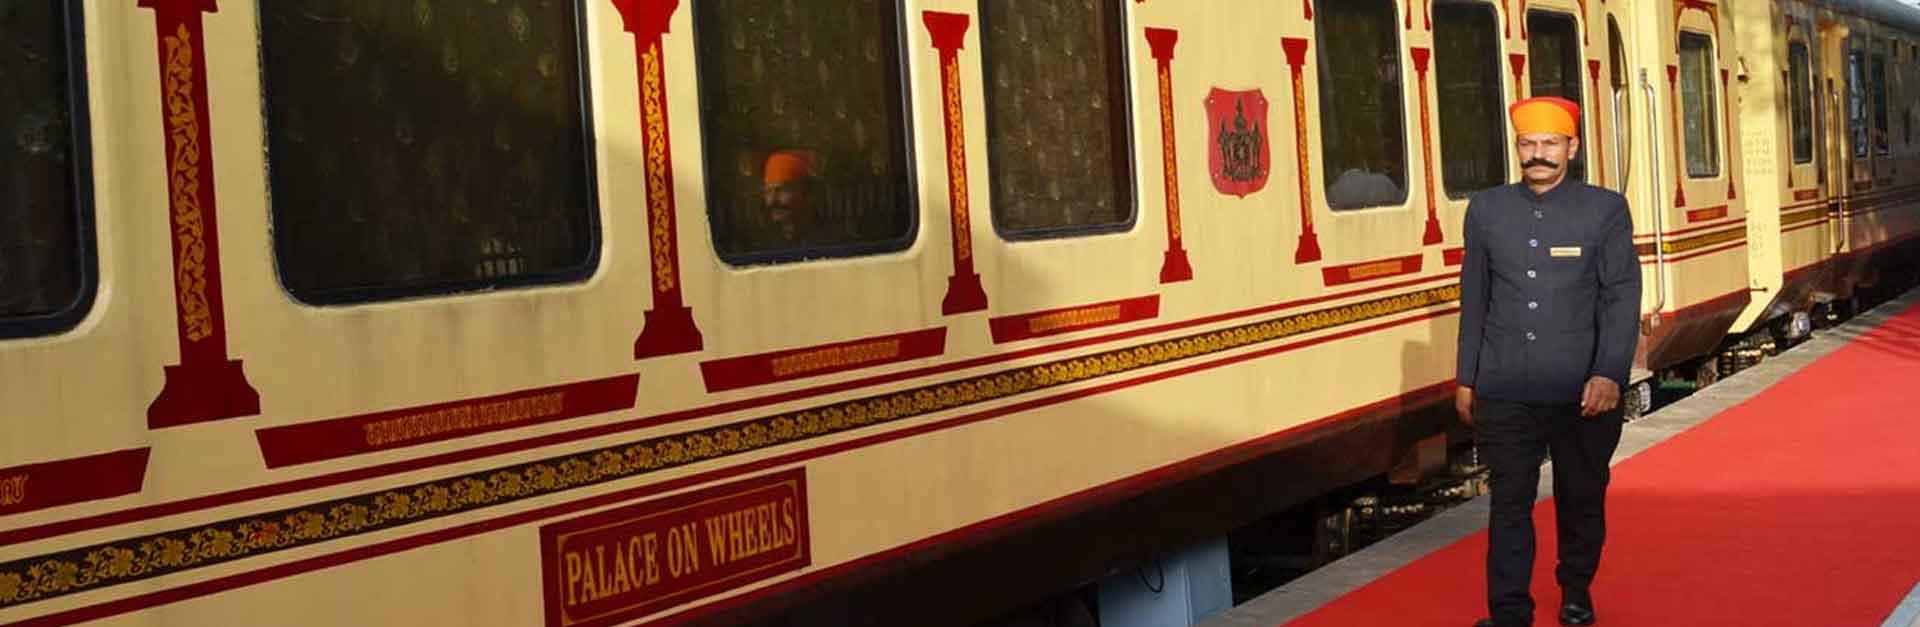 rajasthan train palace on wheels